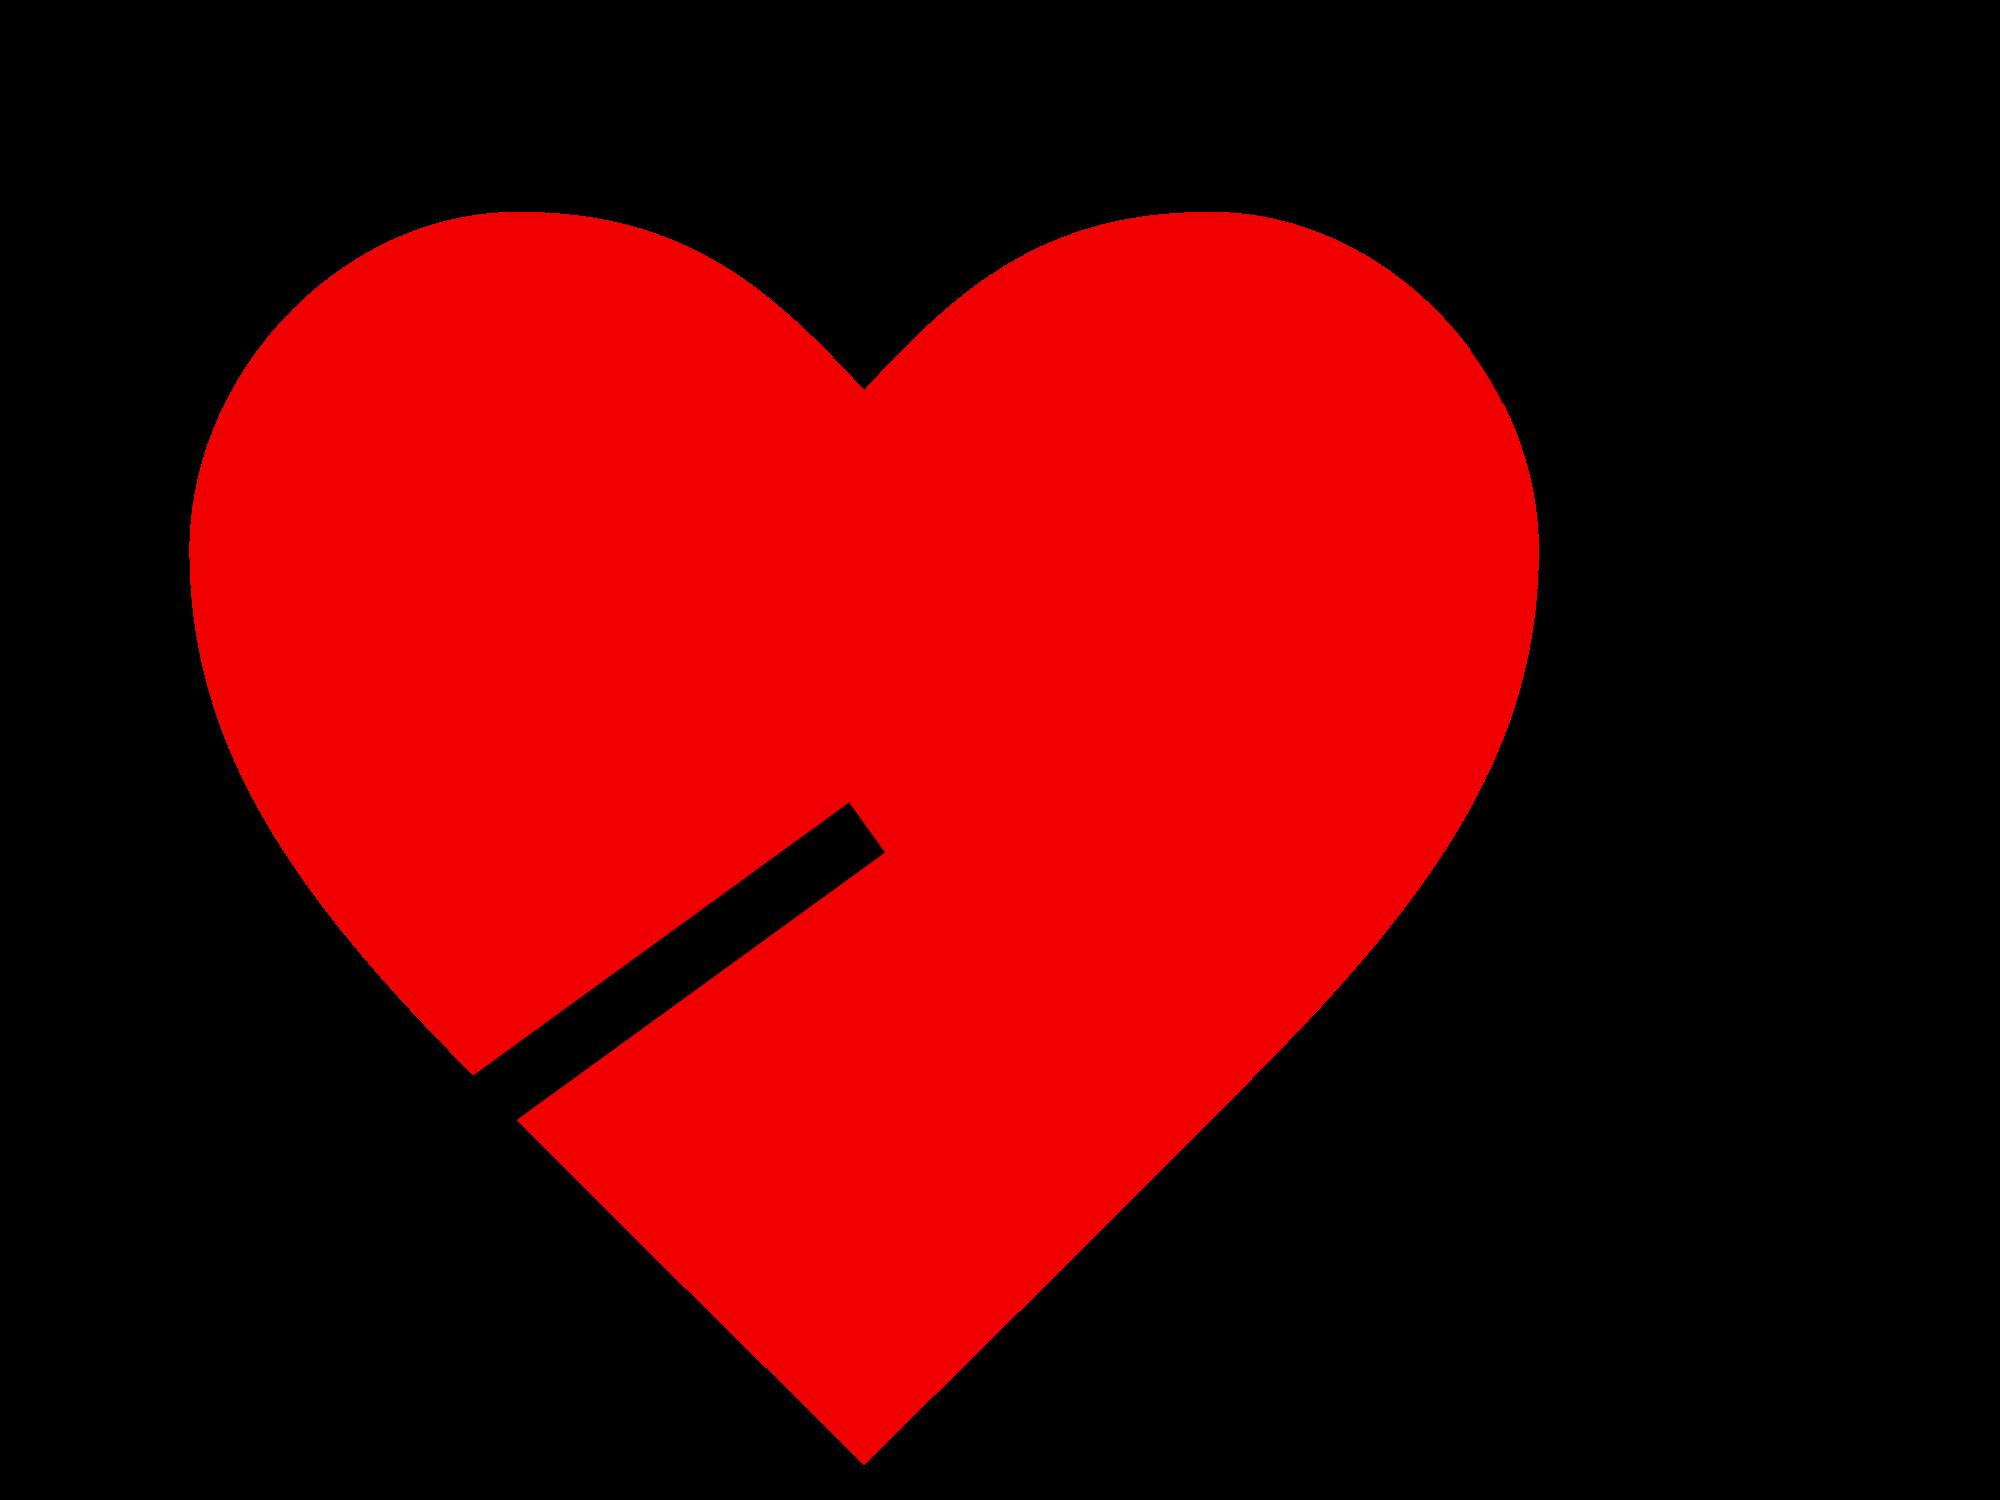 Heart With Arrow Clip Art - ClipArt Best